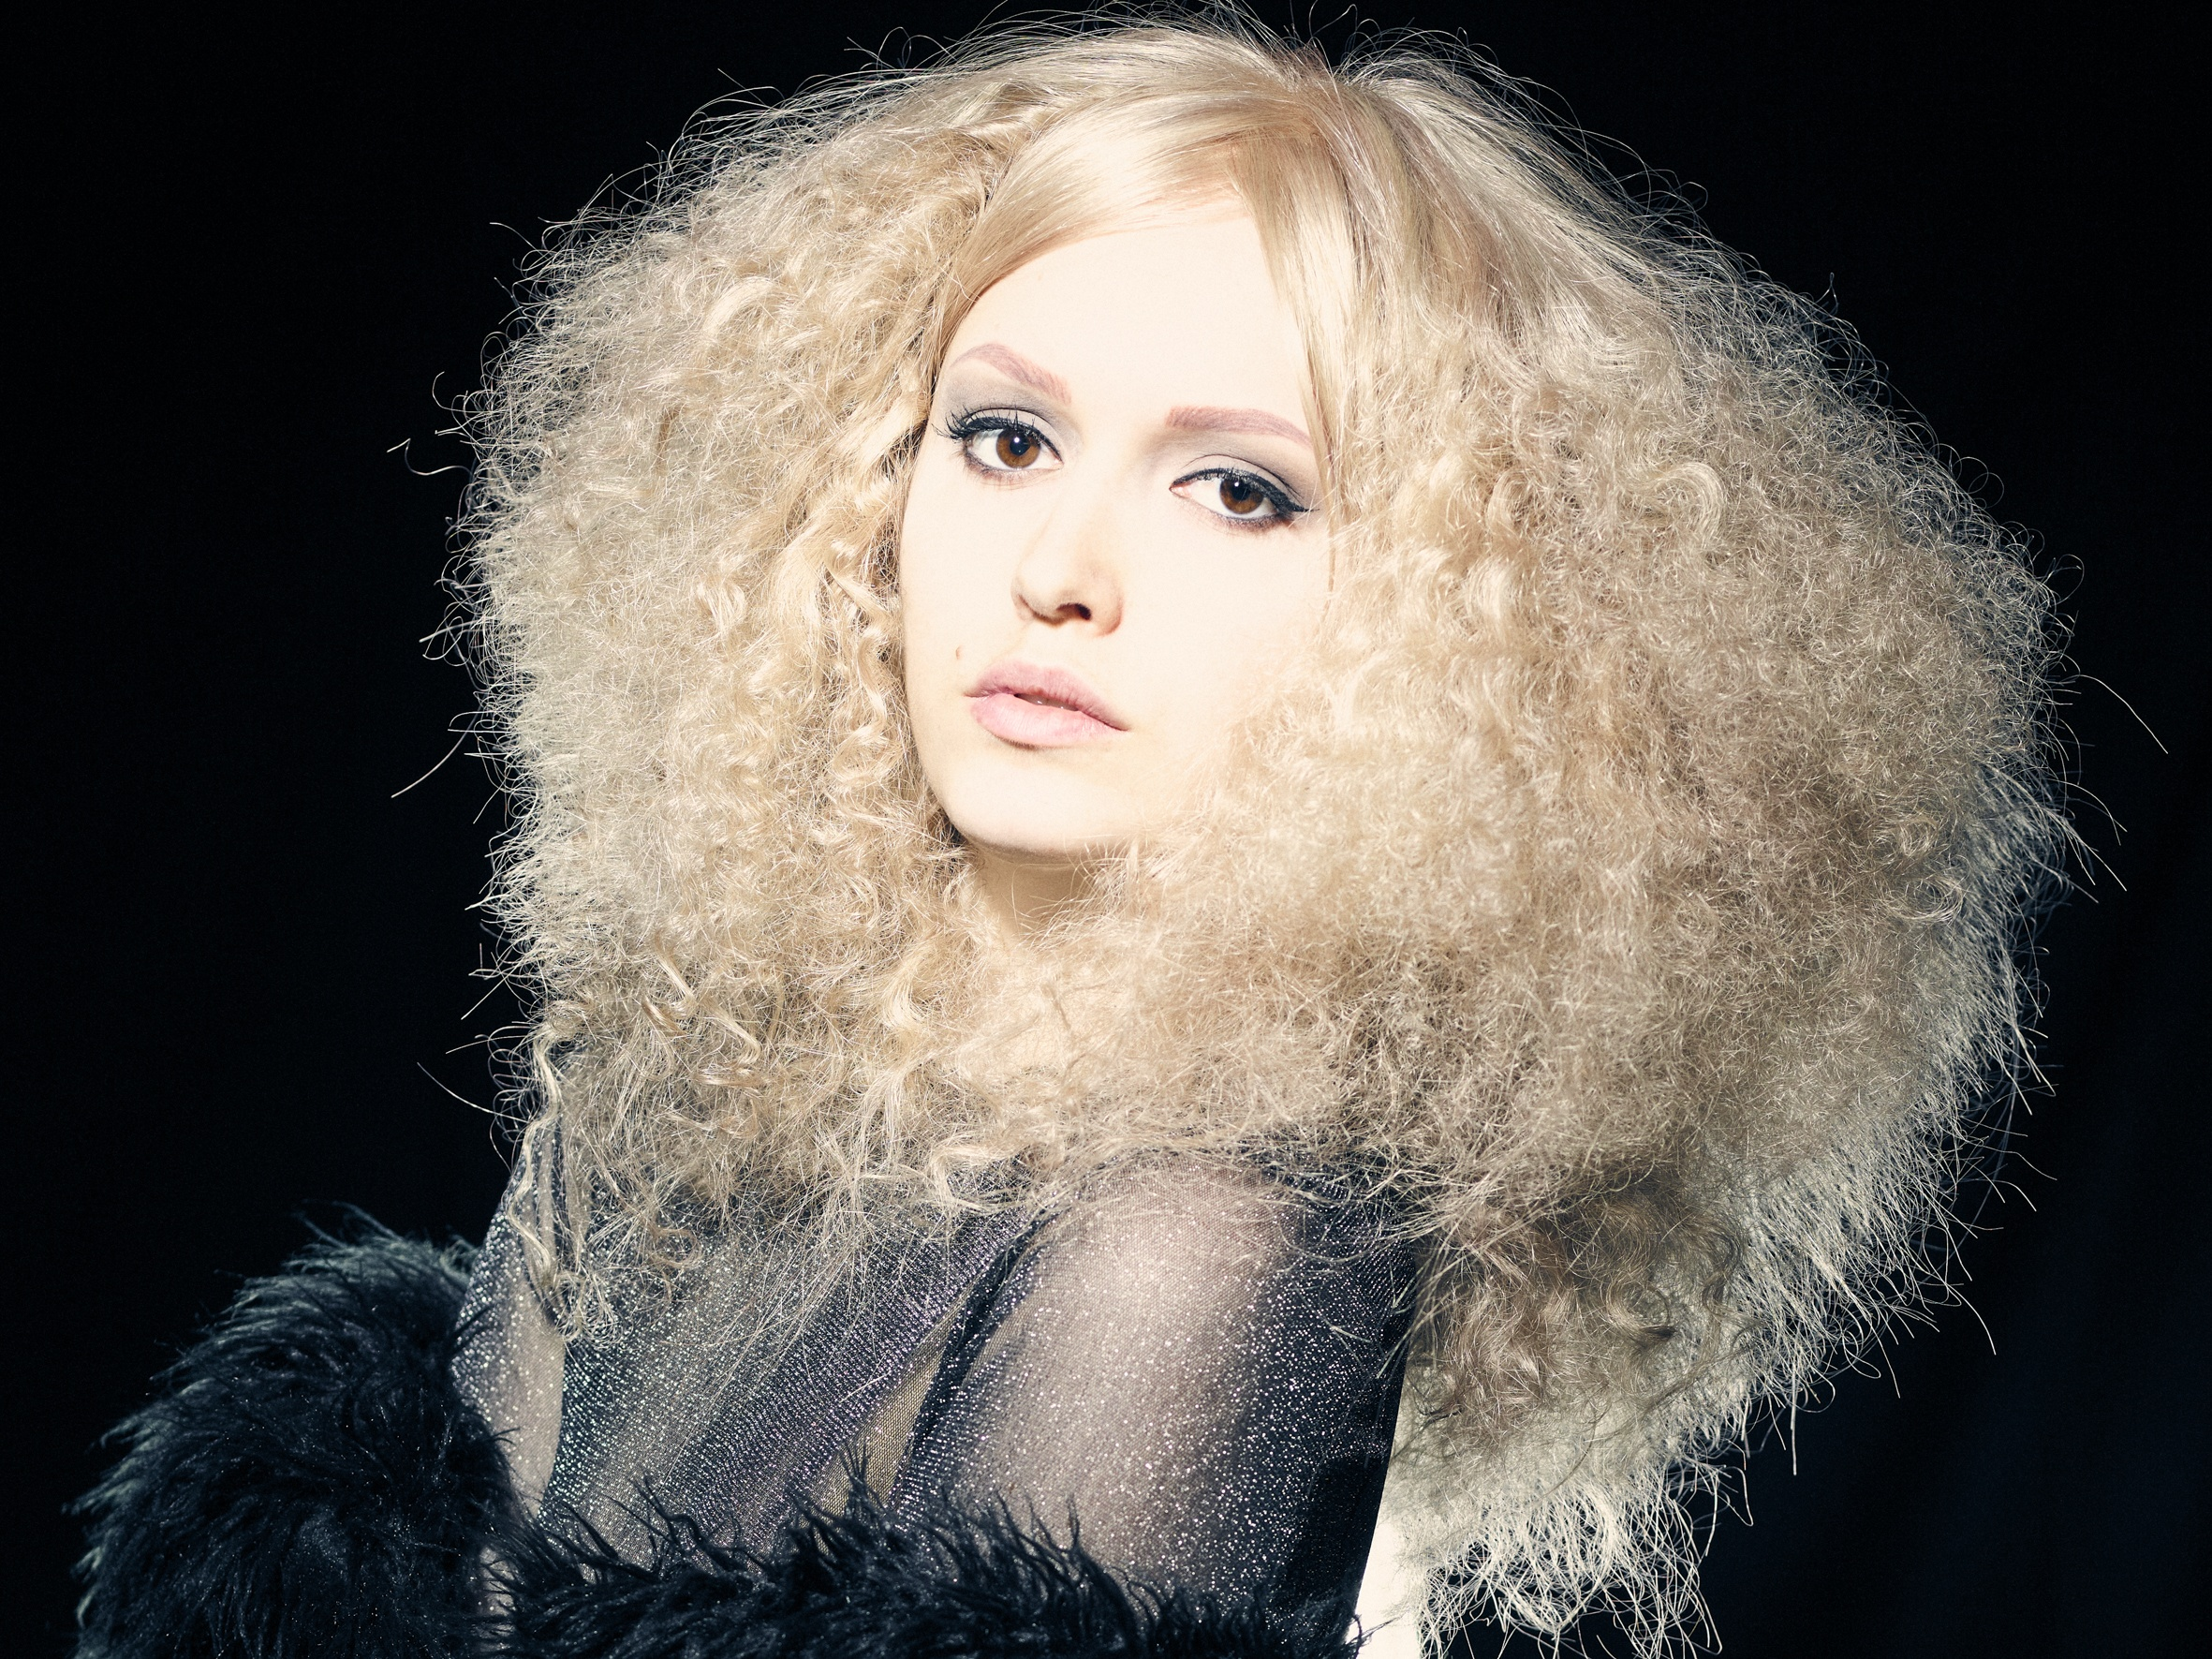 Sofia hårmodell med alopecia har på lys krøllete parykk